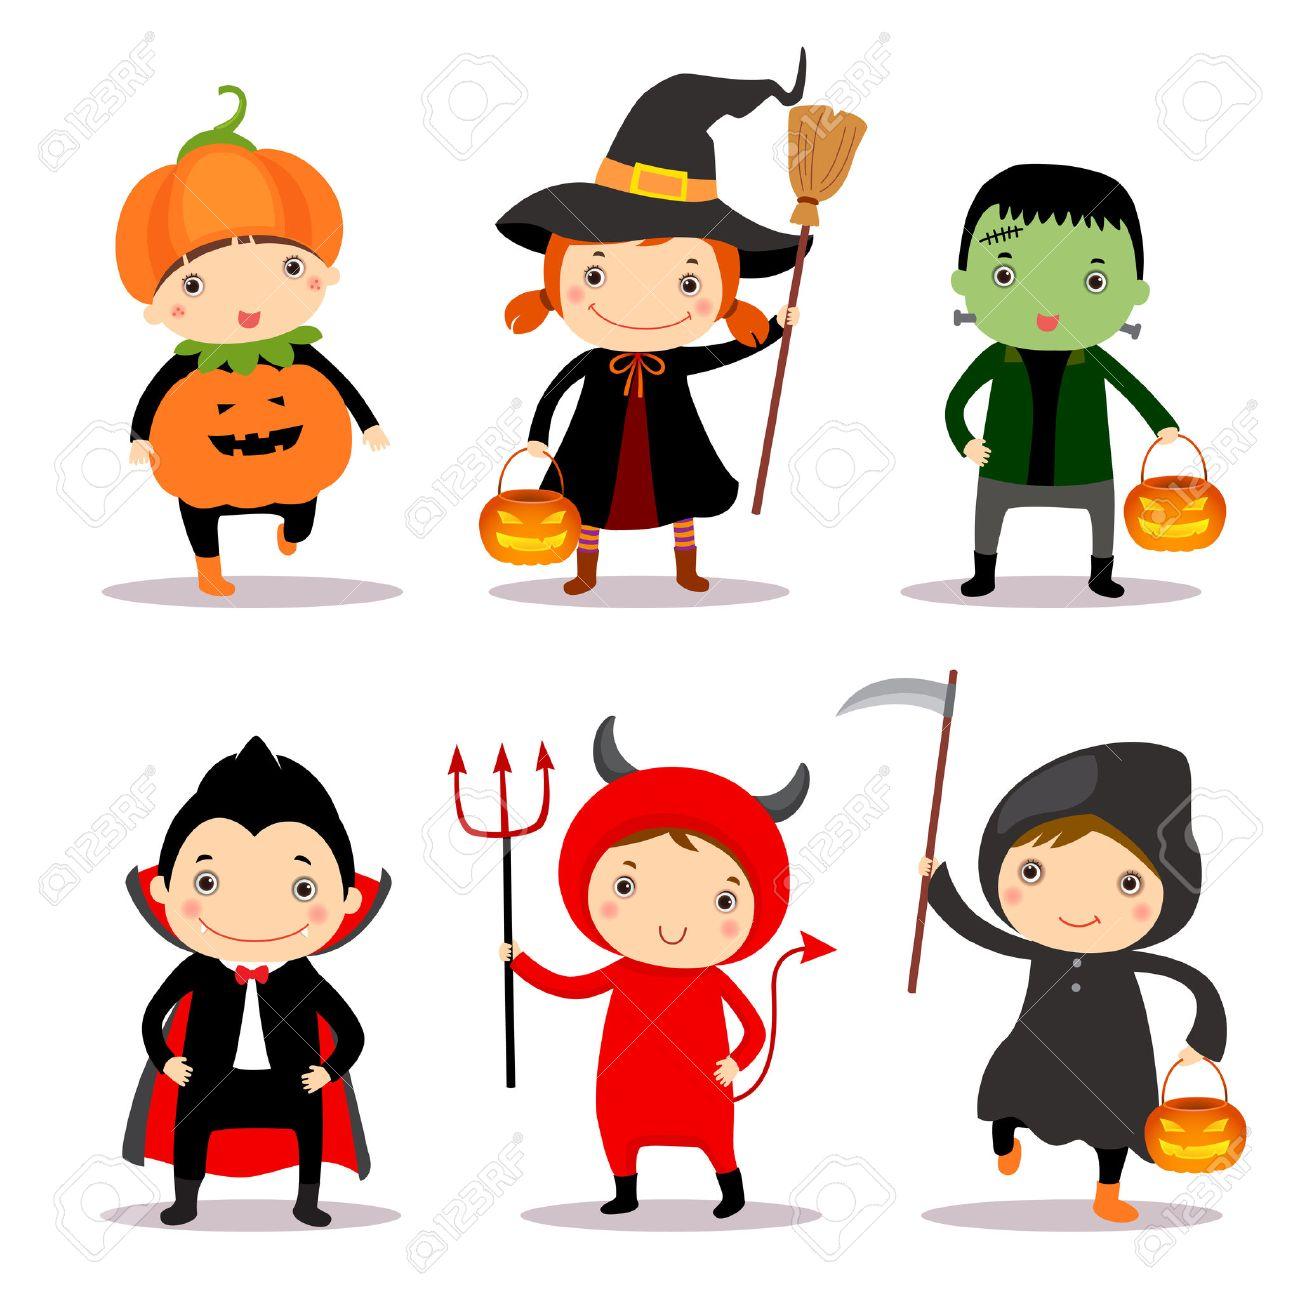 Cute kids wearing halloween costumes - 44221517